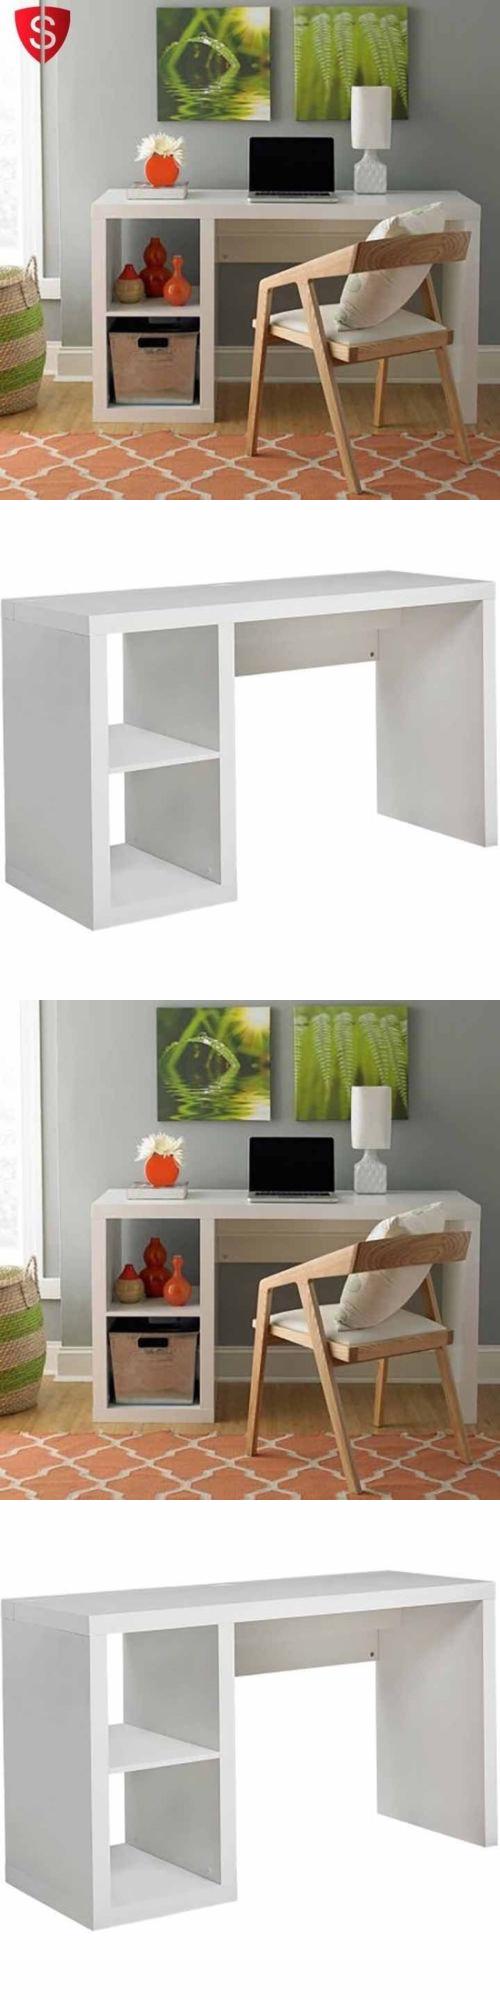 Office Furniture: Computer Table Desk Office Home Workstation ...